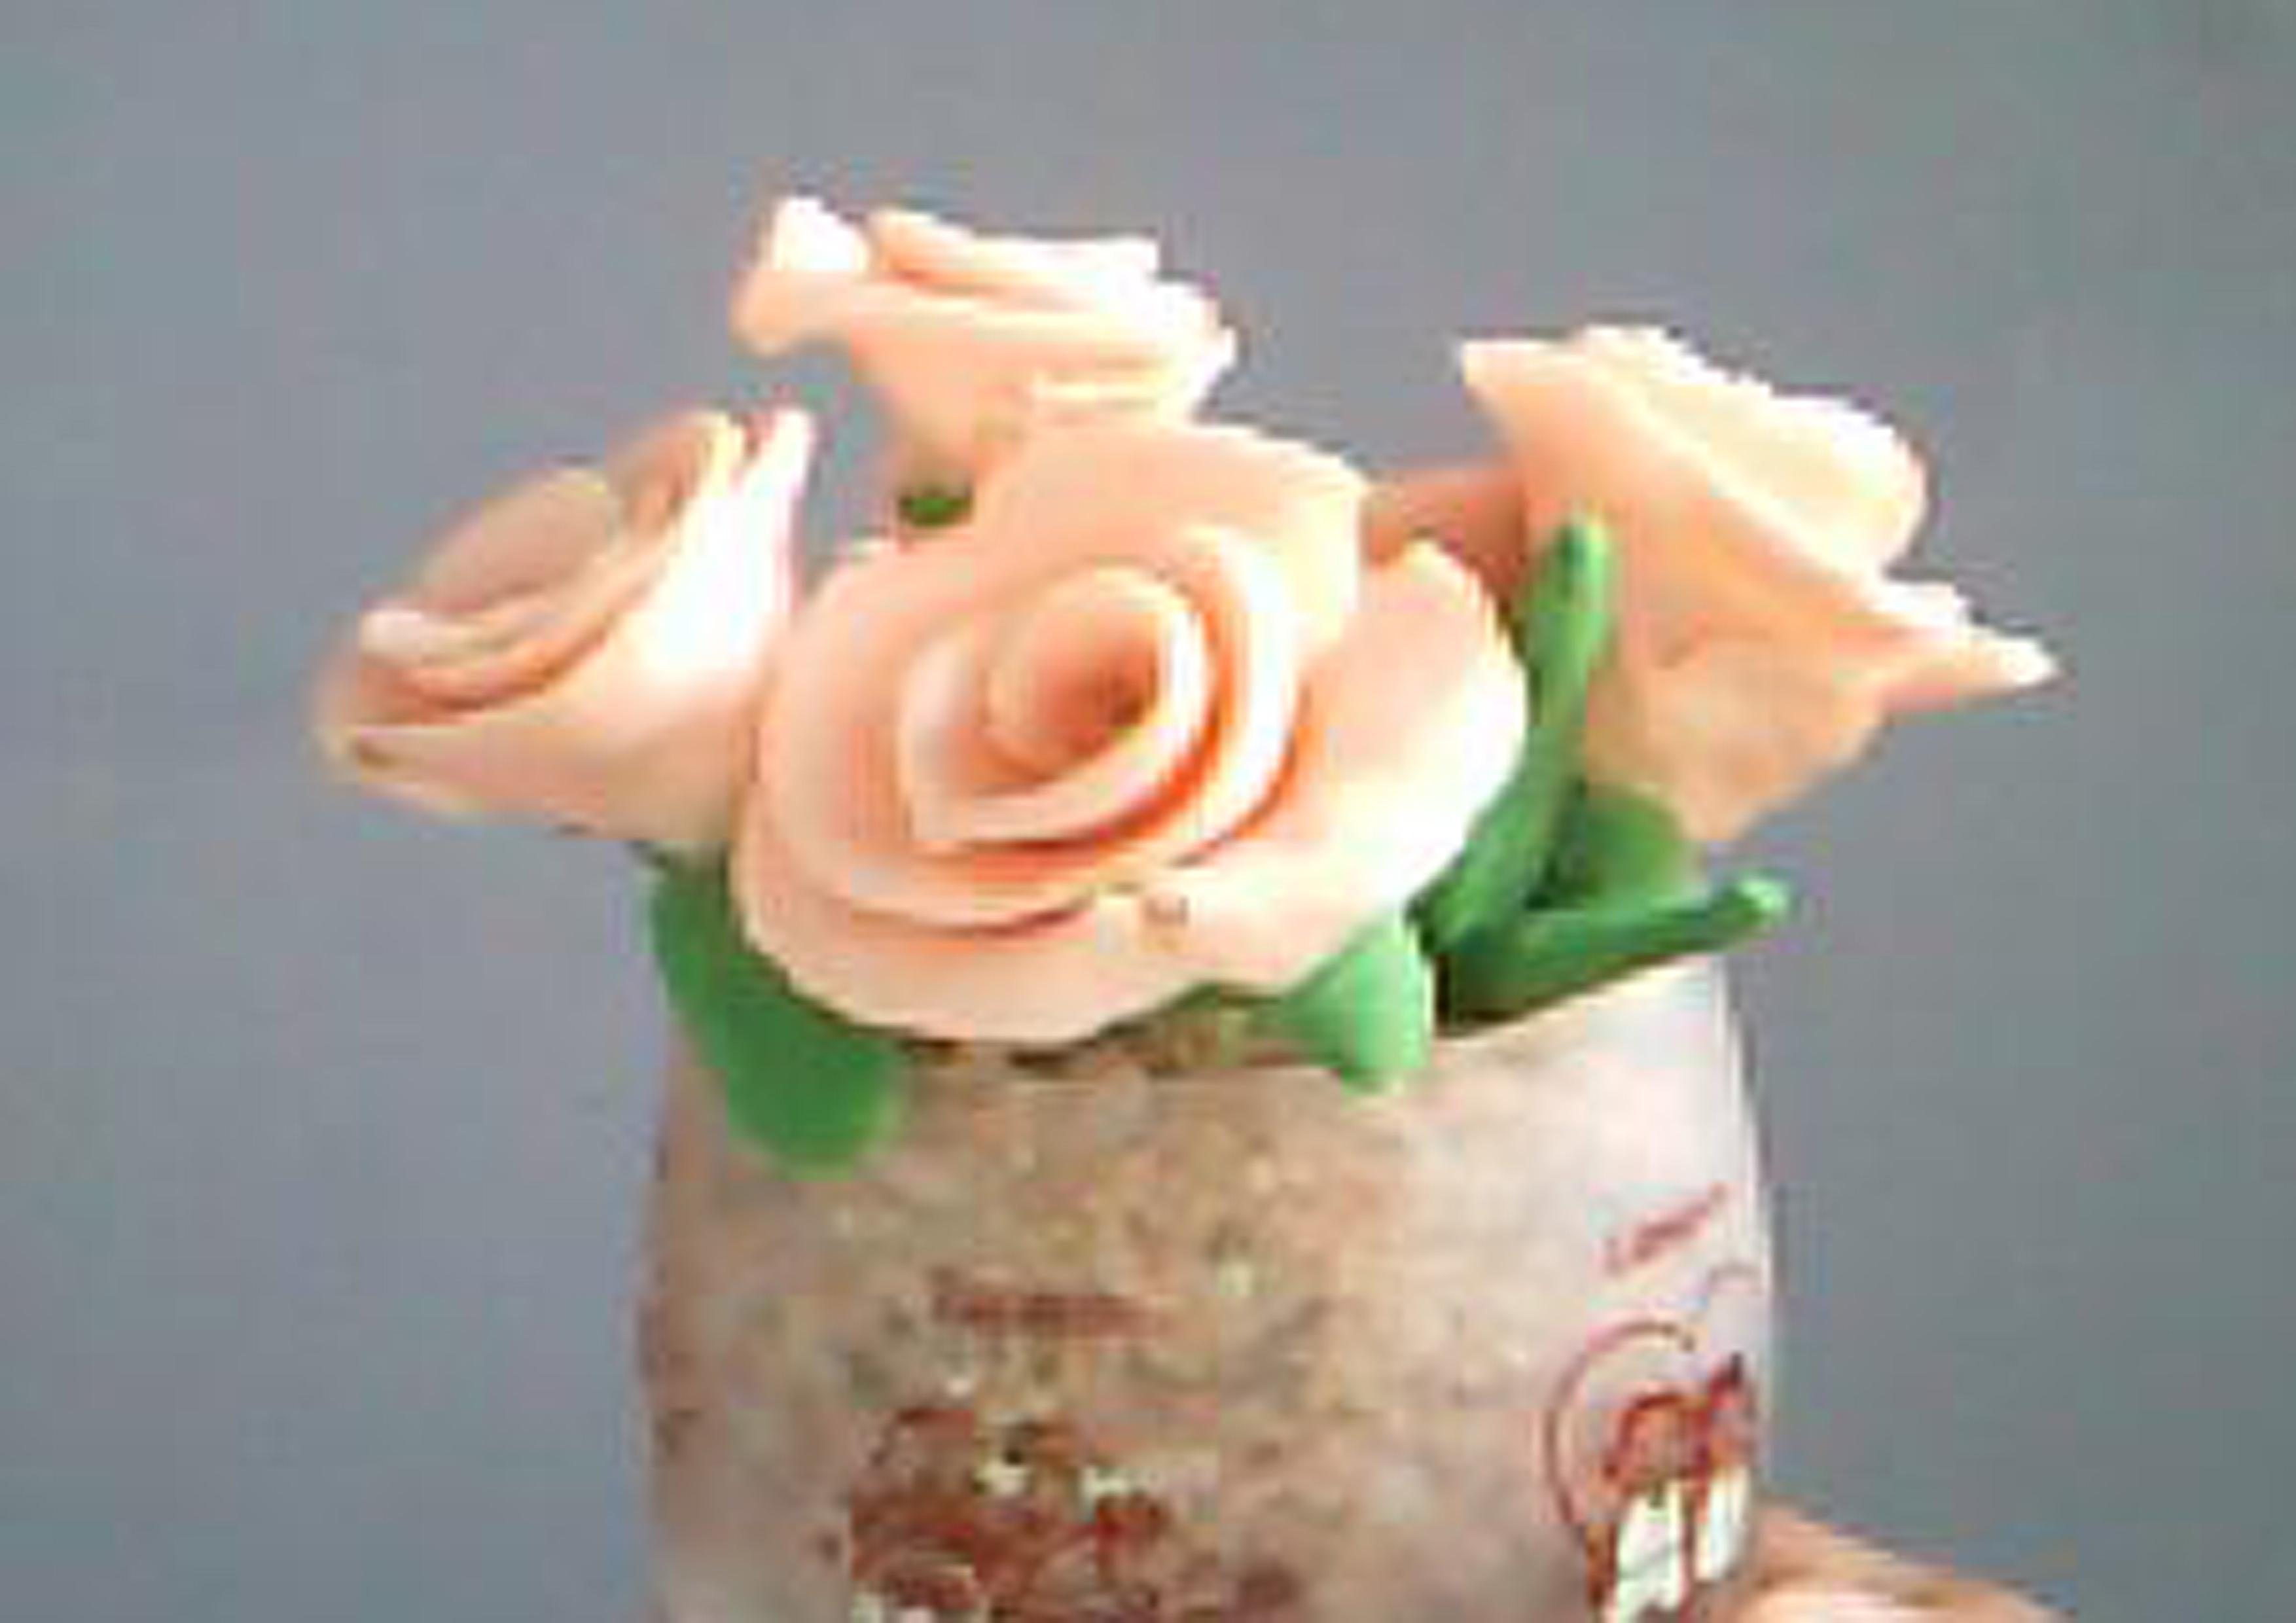 Gambar Kerajinan Bunga Dari Sabun